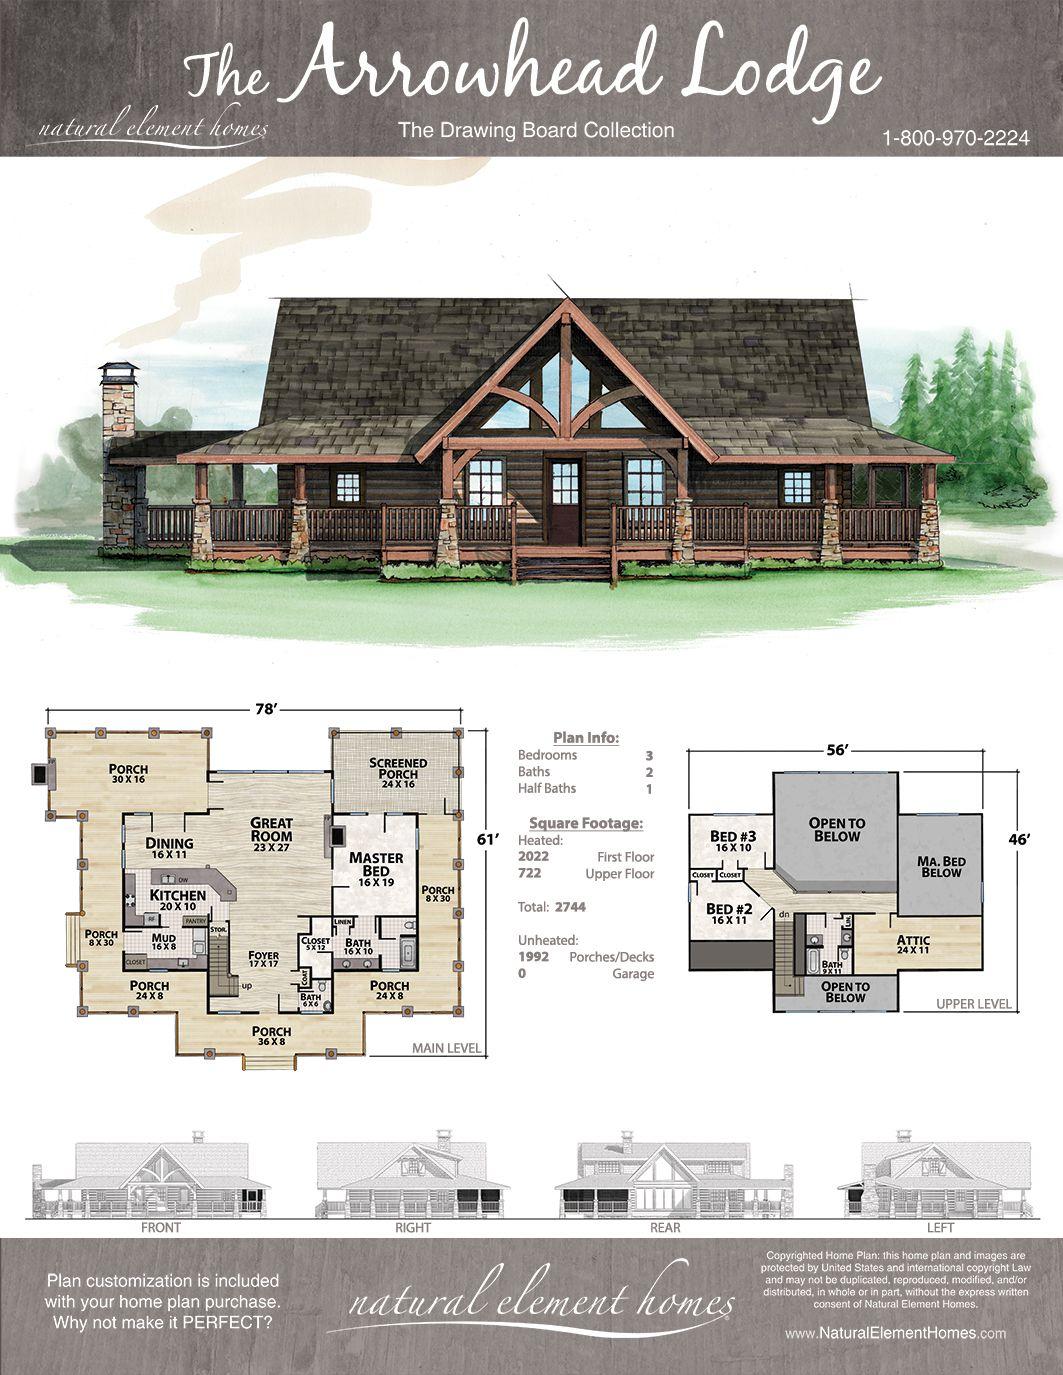 Arrowhead Lodge Lake House Plans Cabin House Plans Dream House Plans